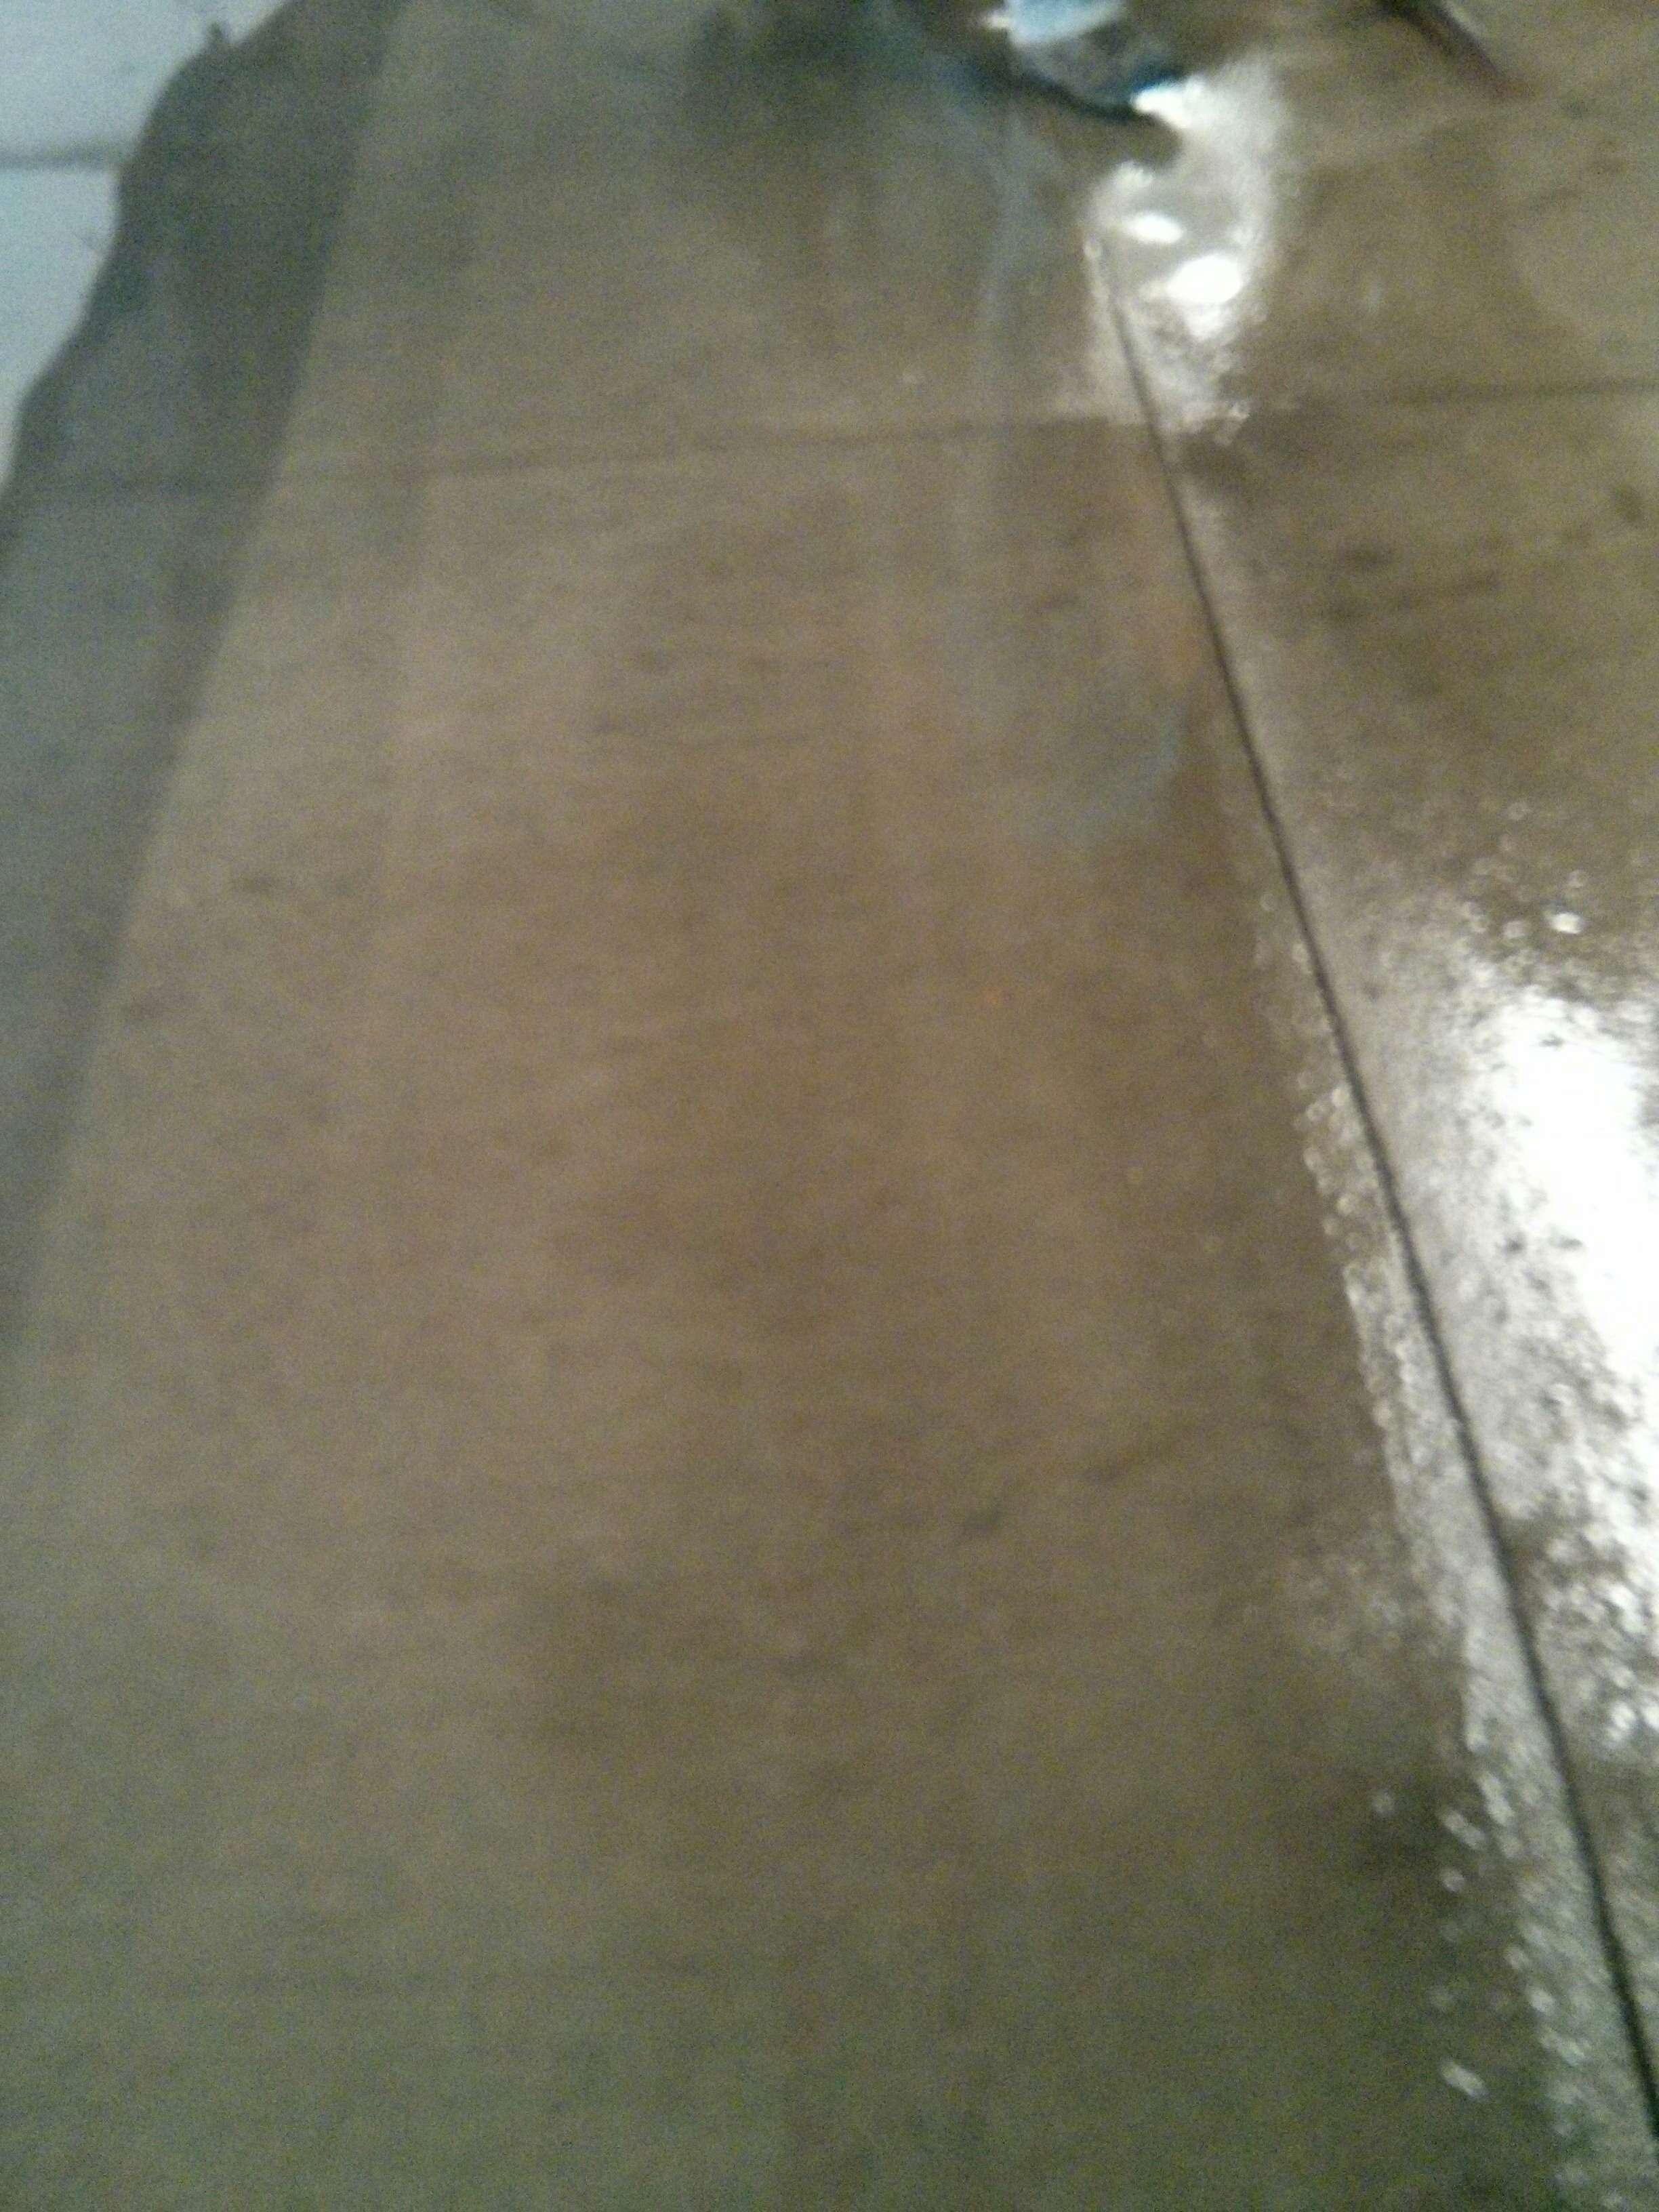 Scrub n Shine uses NEW high pressure surface cleaning equipment